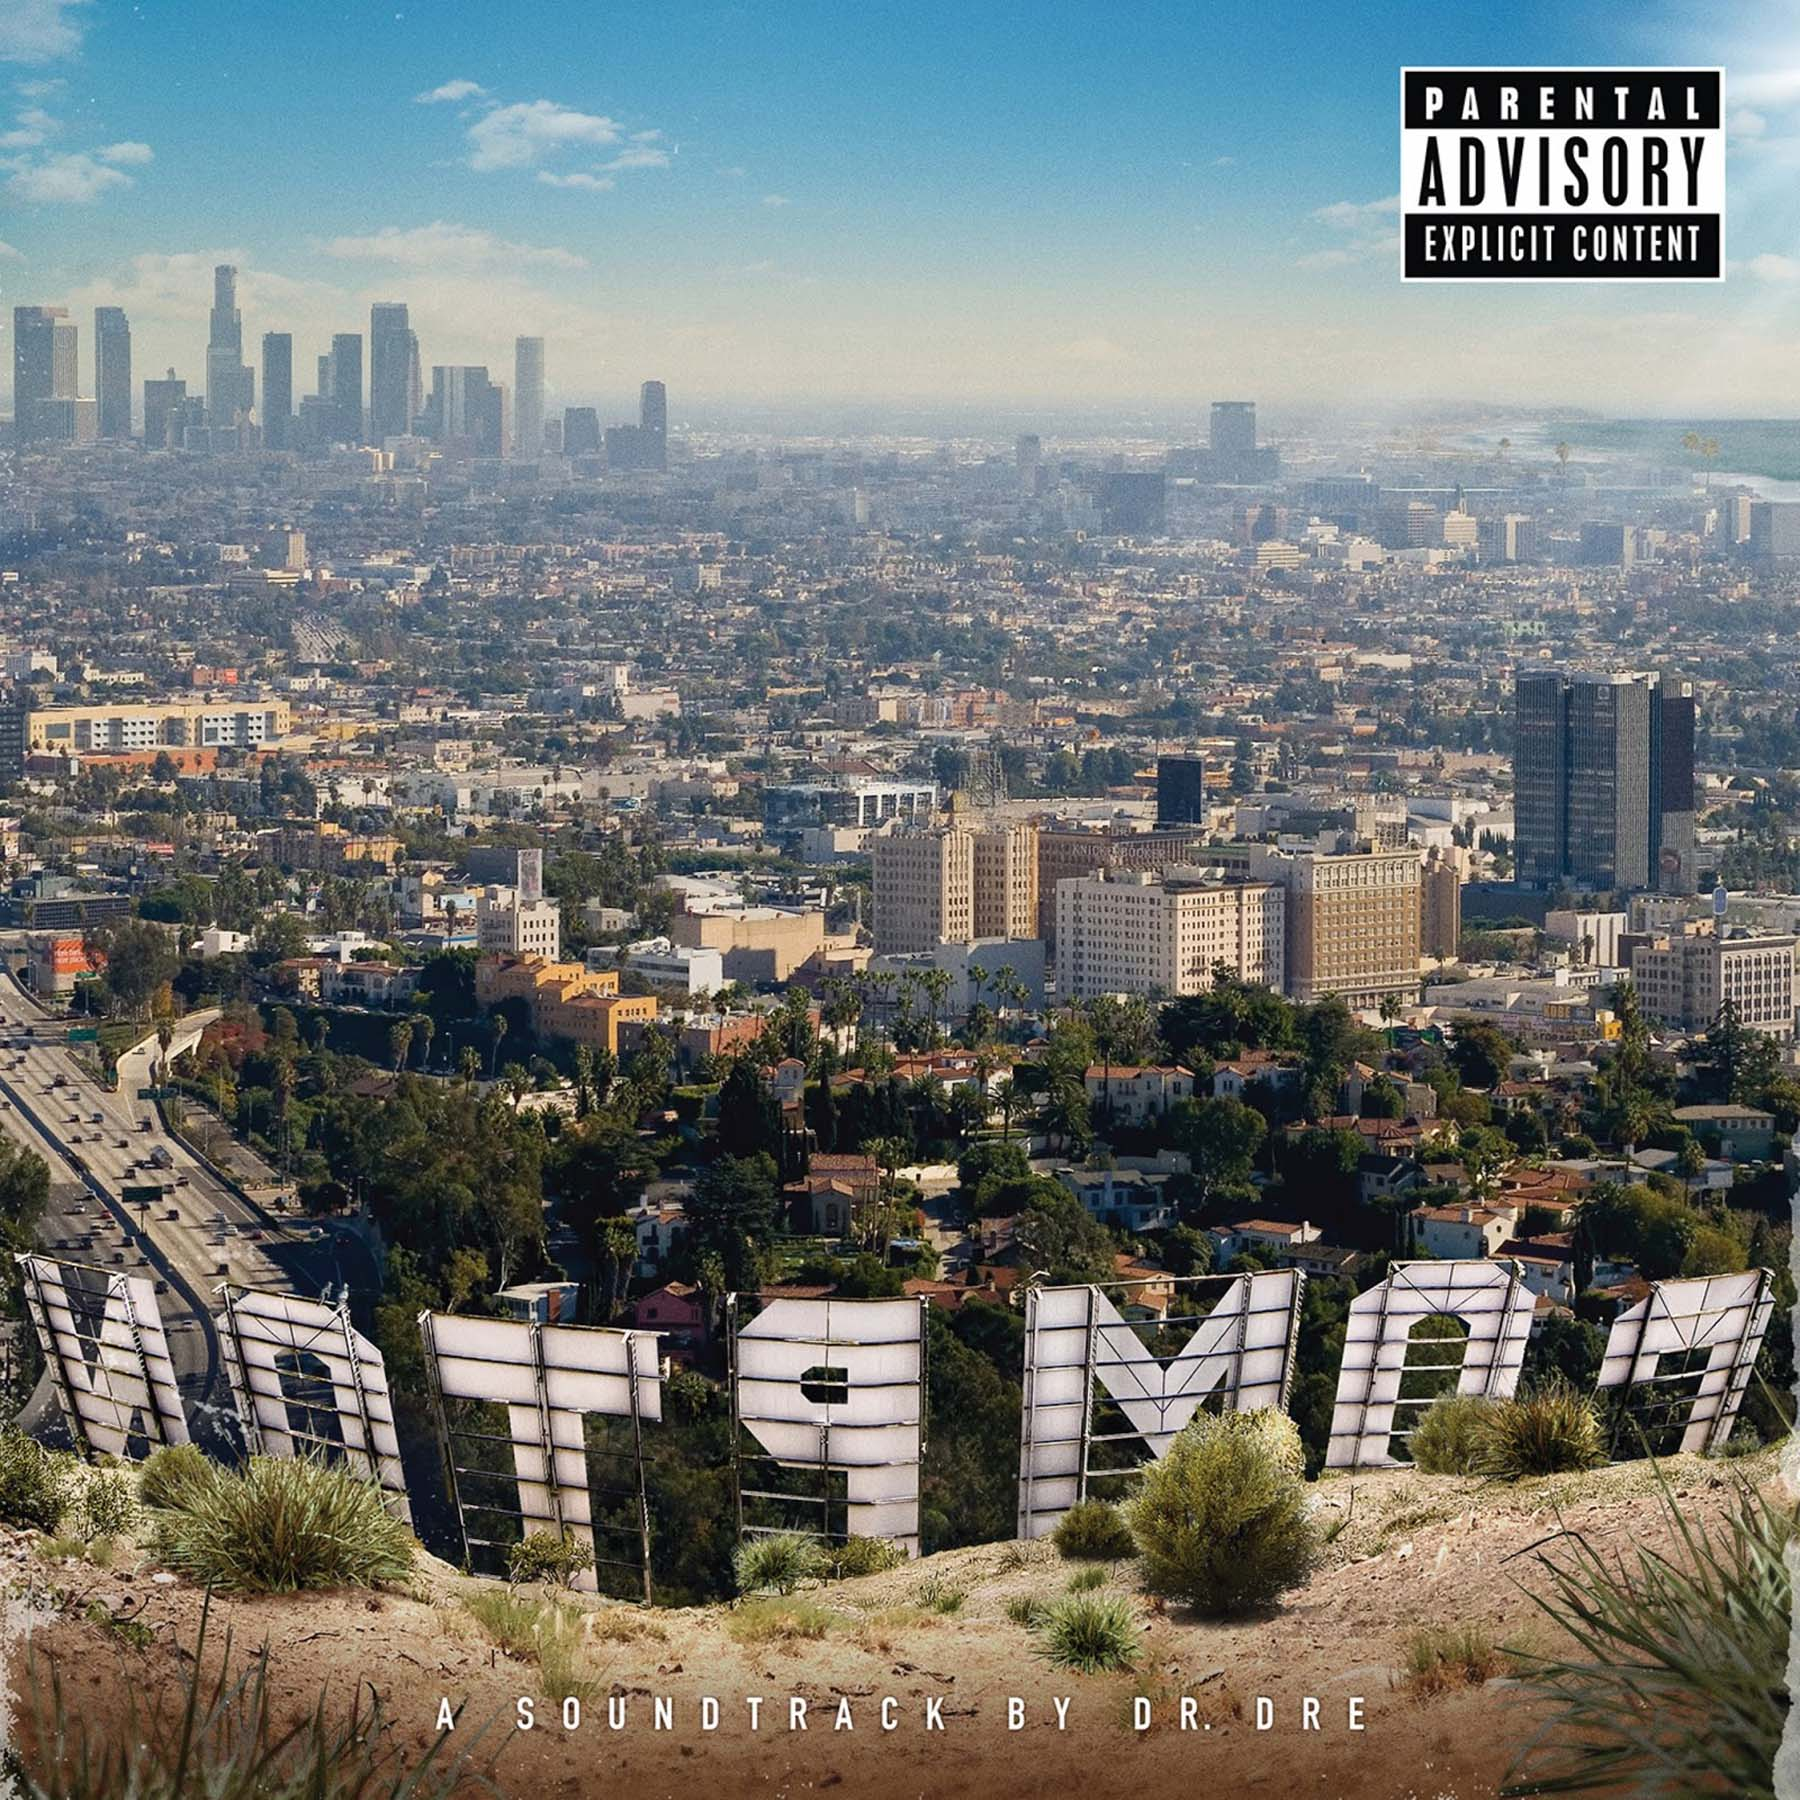 Compton Explicit LyricsDr. Dre Label: Aftermath